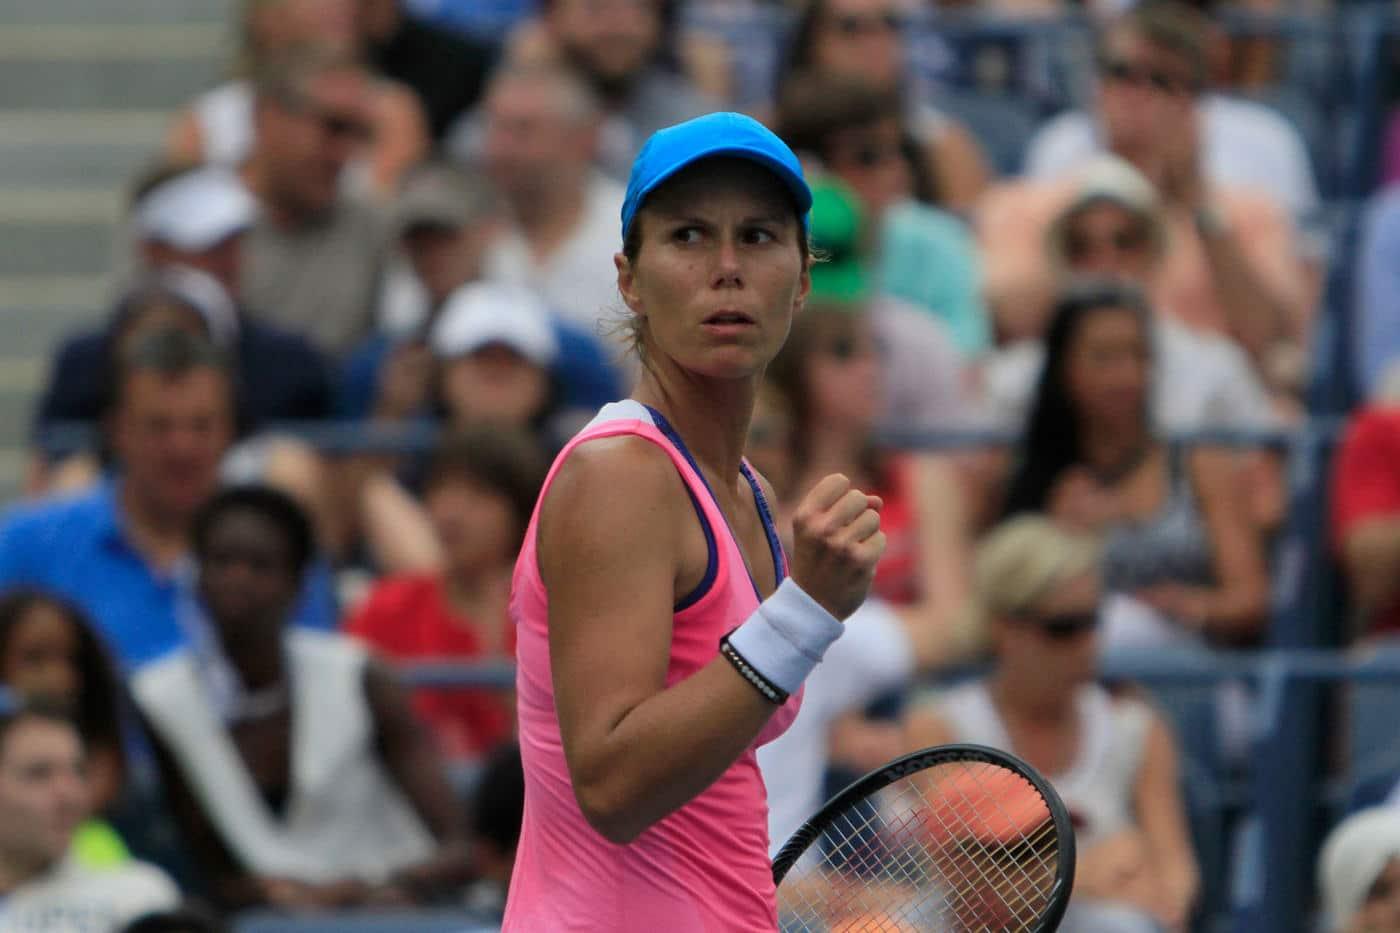 Friday Tennis Blog: US Open Buzz, Player Throws Down ...Varvara Lepchenko Matches